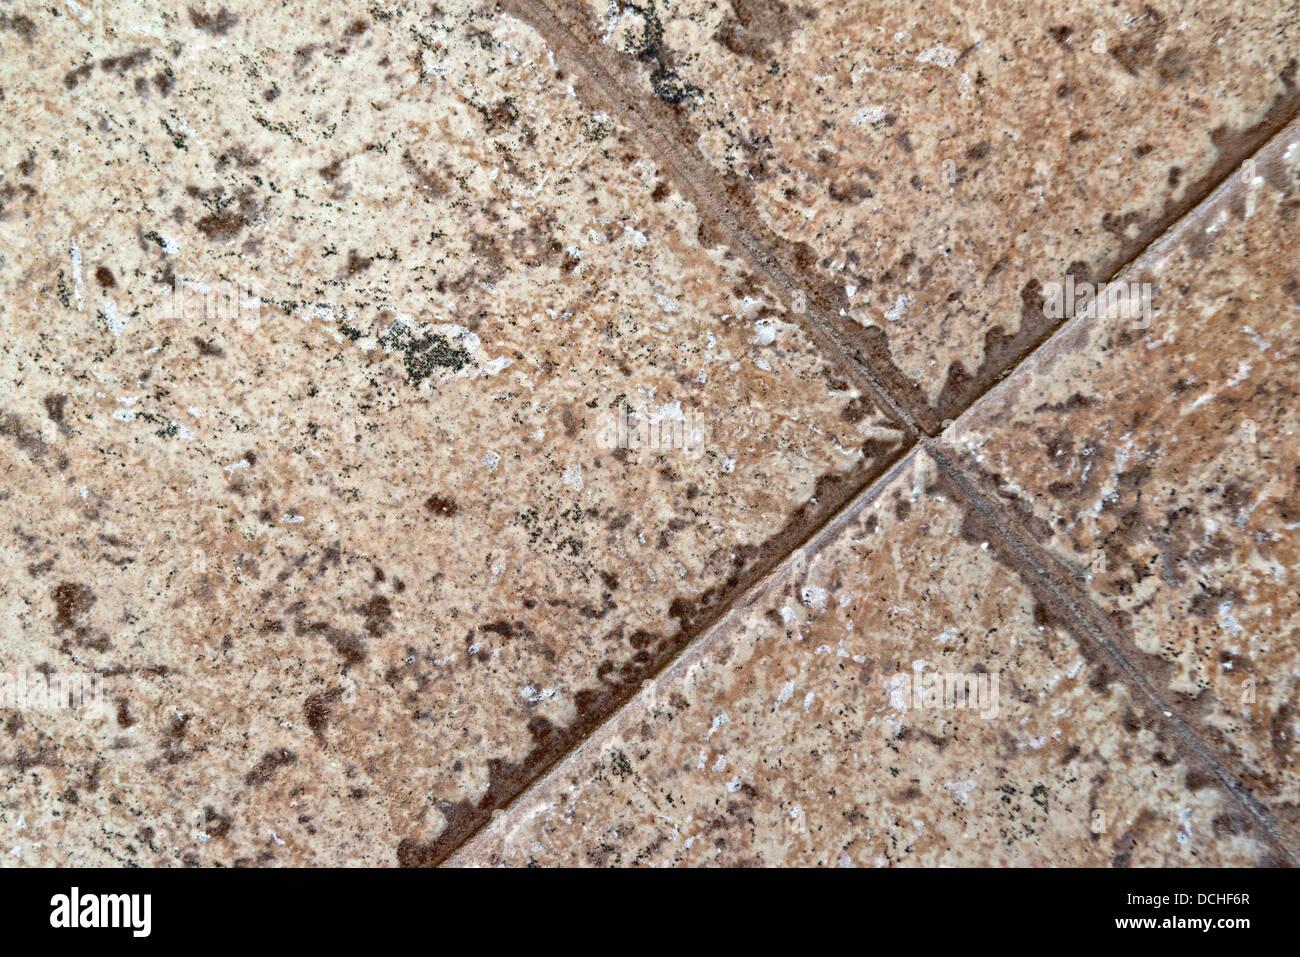 Piastrella ceramica texture il beige mosaico di piastrelle in